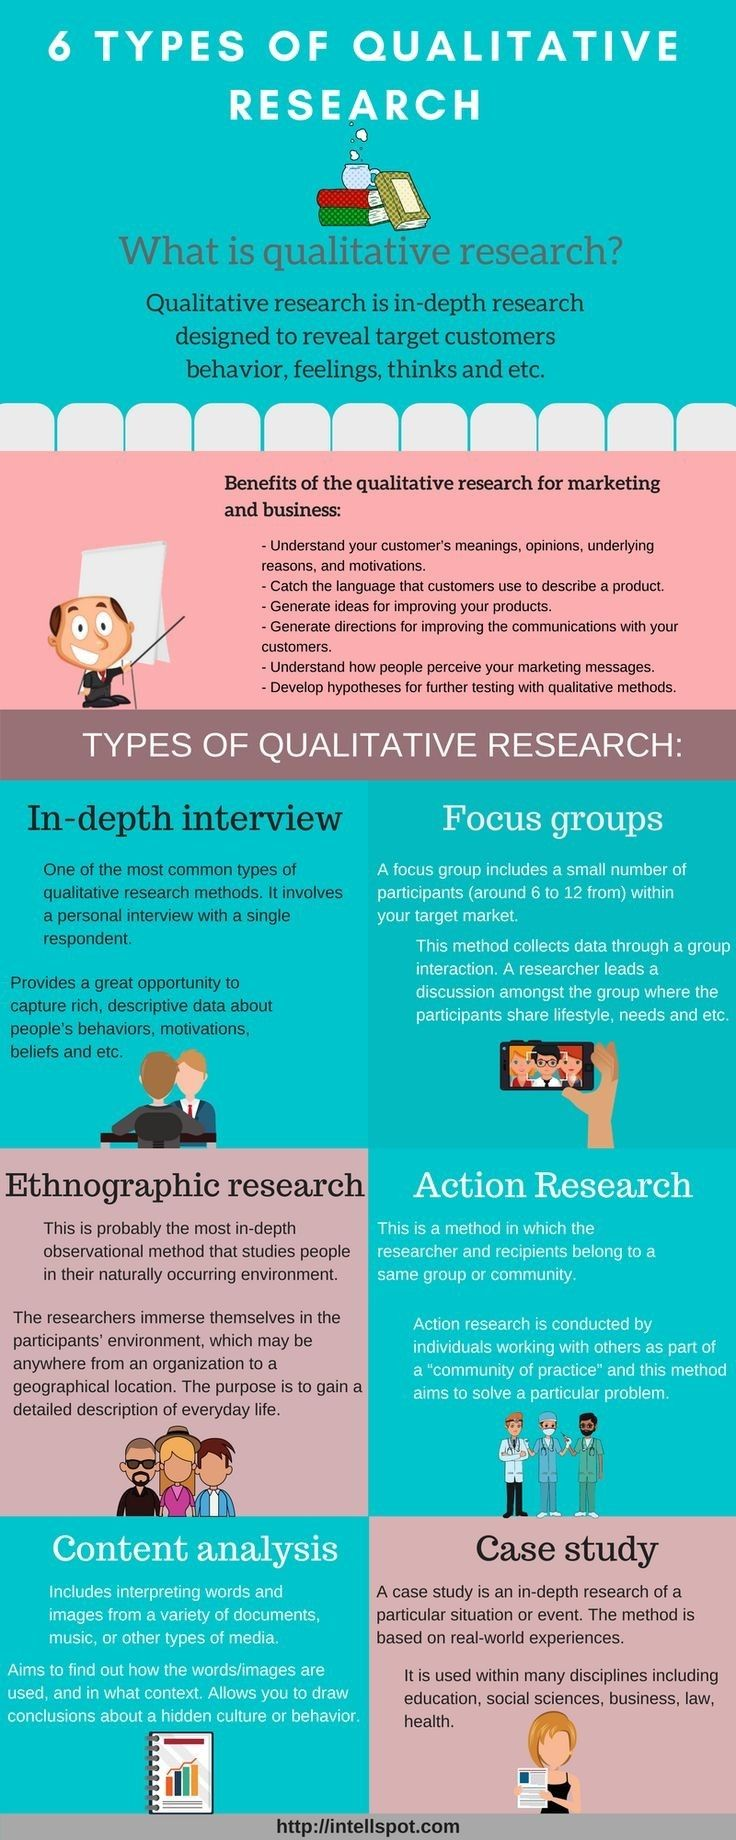 Qualitative Research Qualitative Research Methods Social Science Research Research Methods